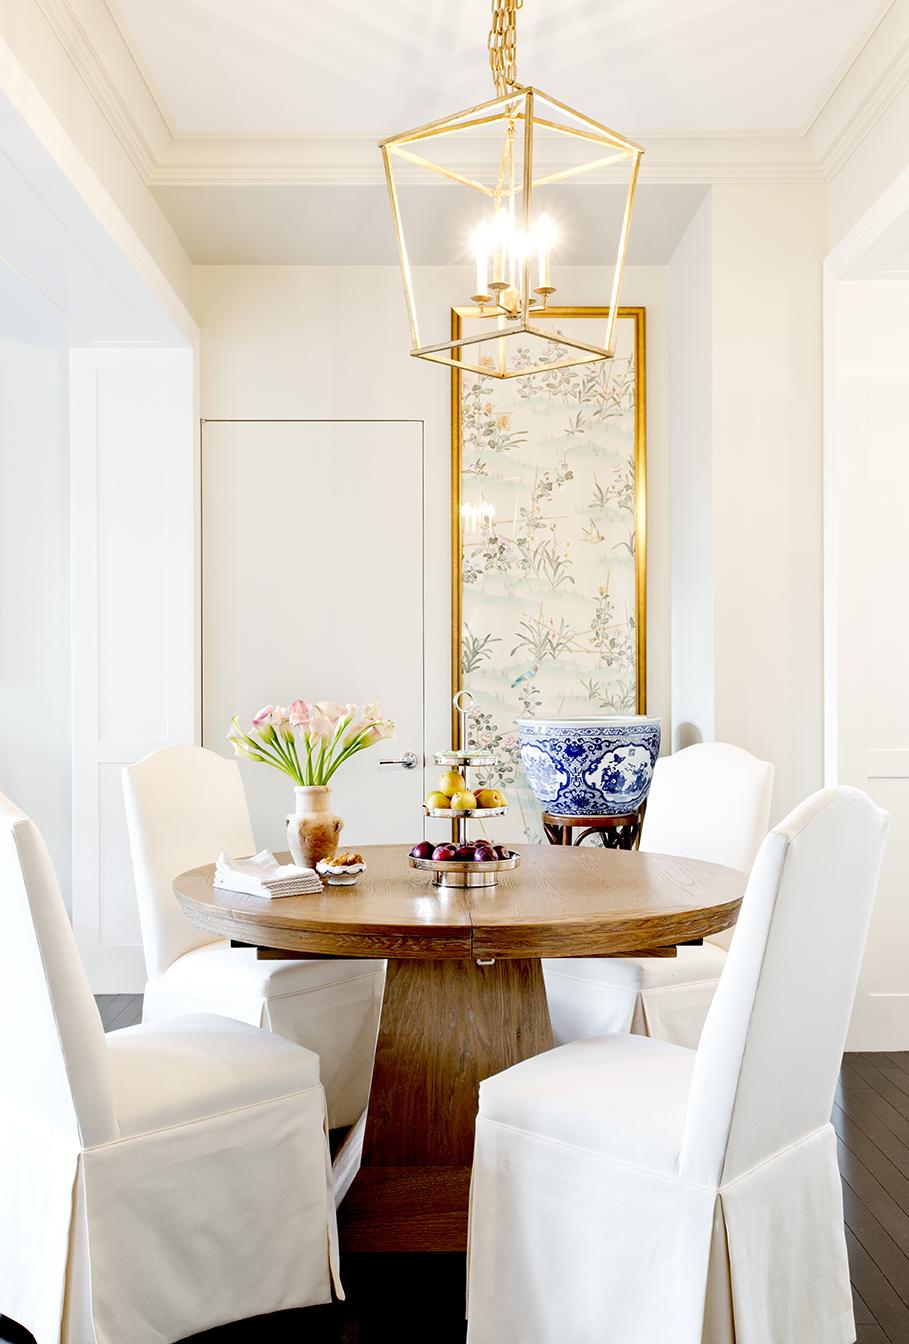 WHIW78_PAMELADAILEYDESIGN-TINY-DINING-ROOM.jpg